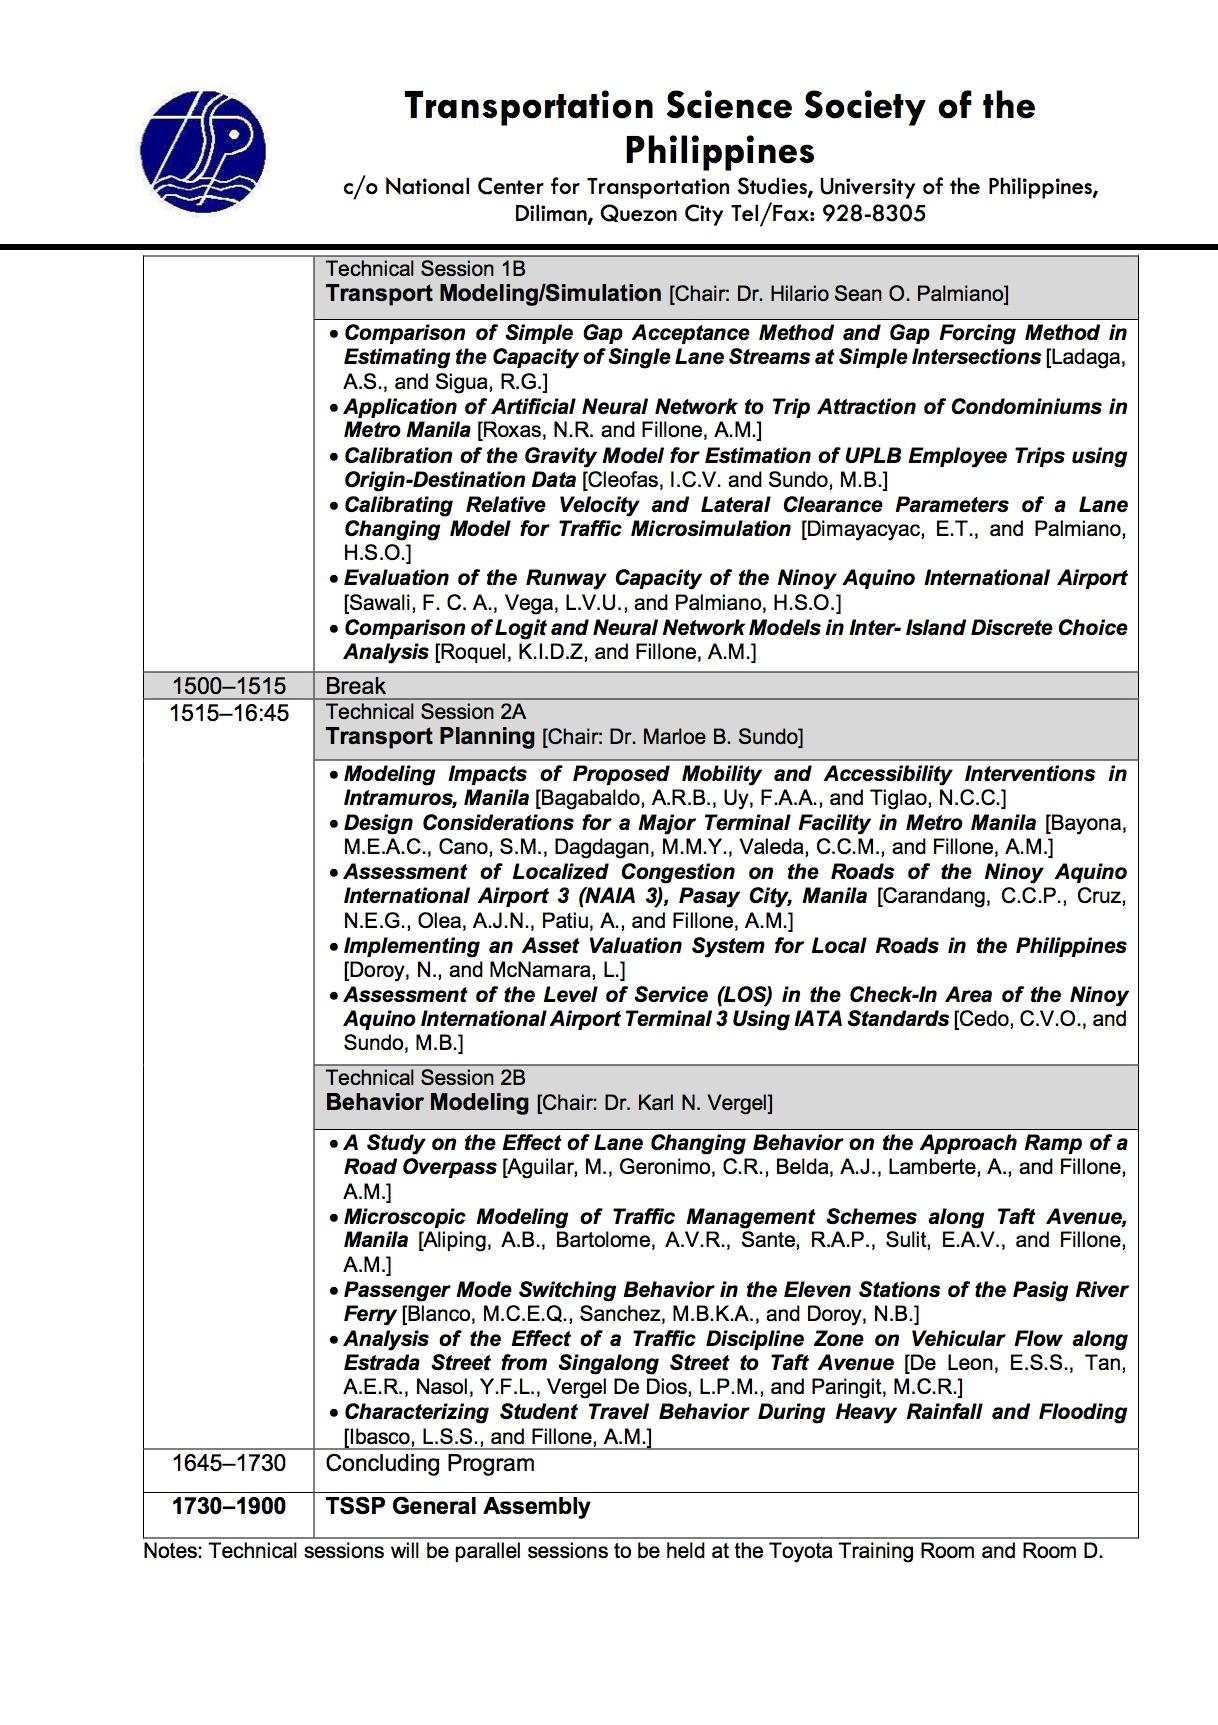 TSSP 2016 Program 05Aug2016-2